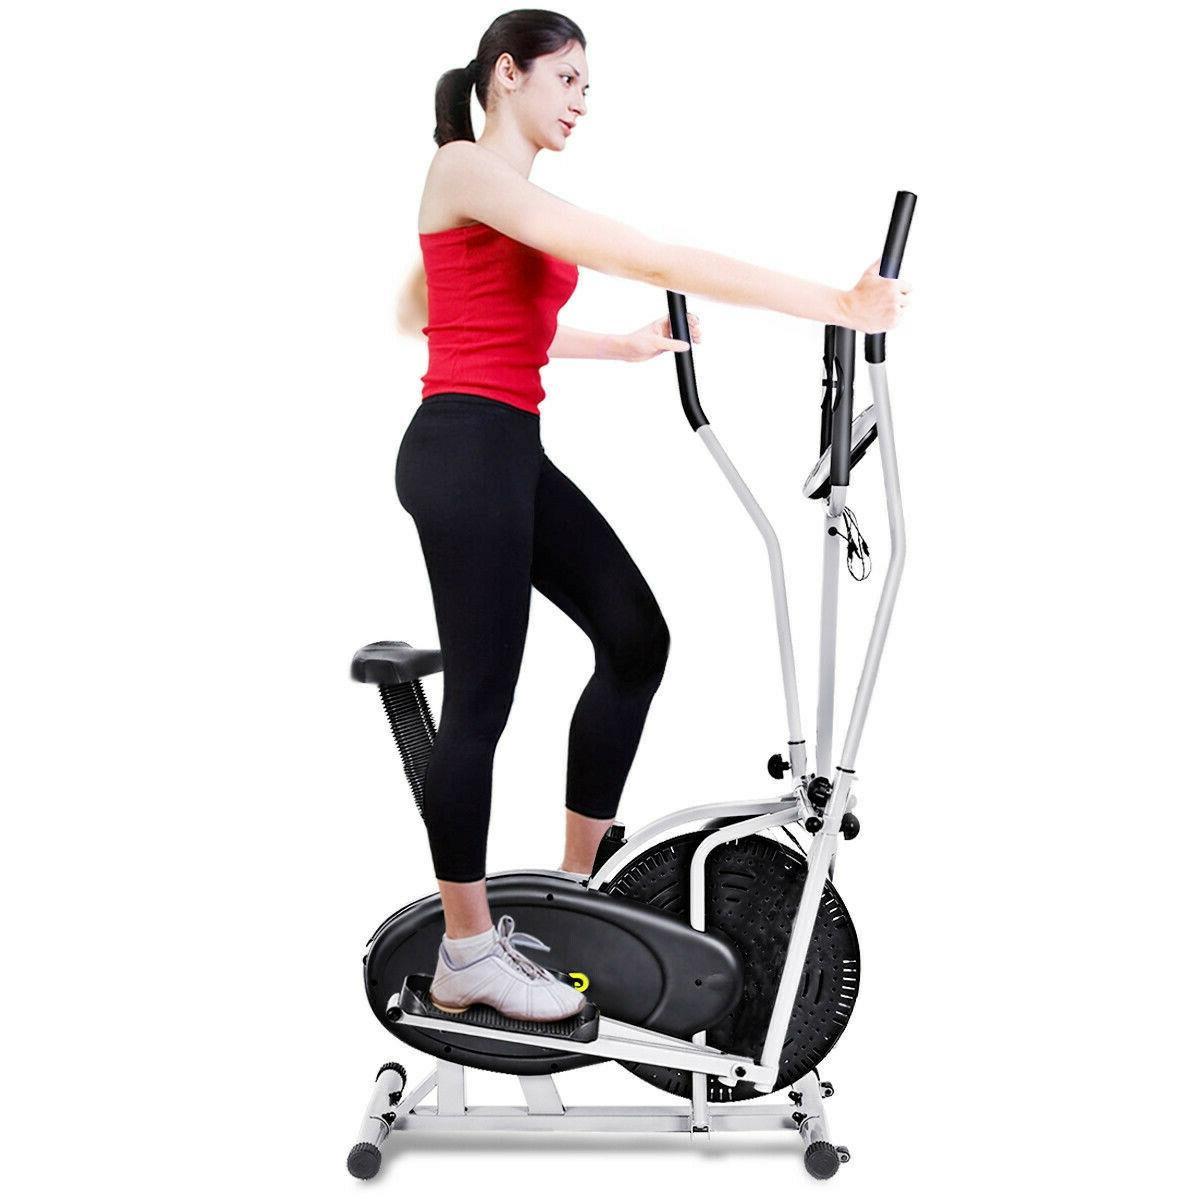 Stair Stepper Elliptical Machine Trainer Bike Cardio Home Gym